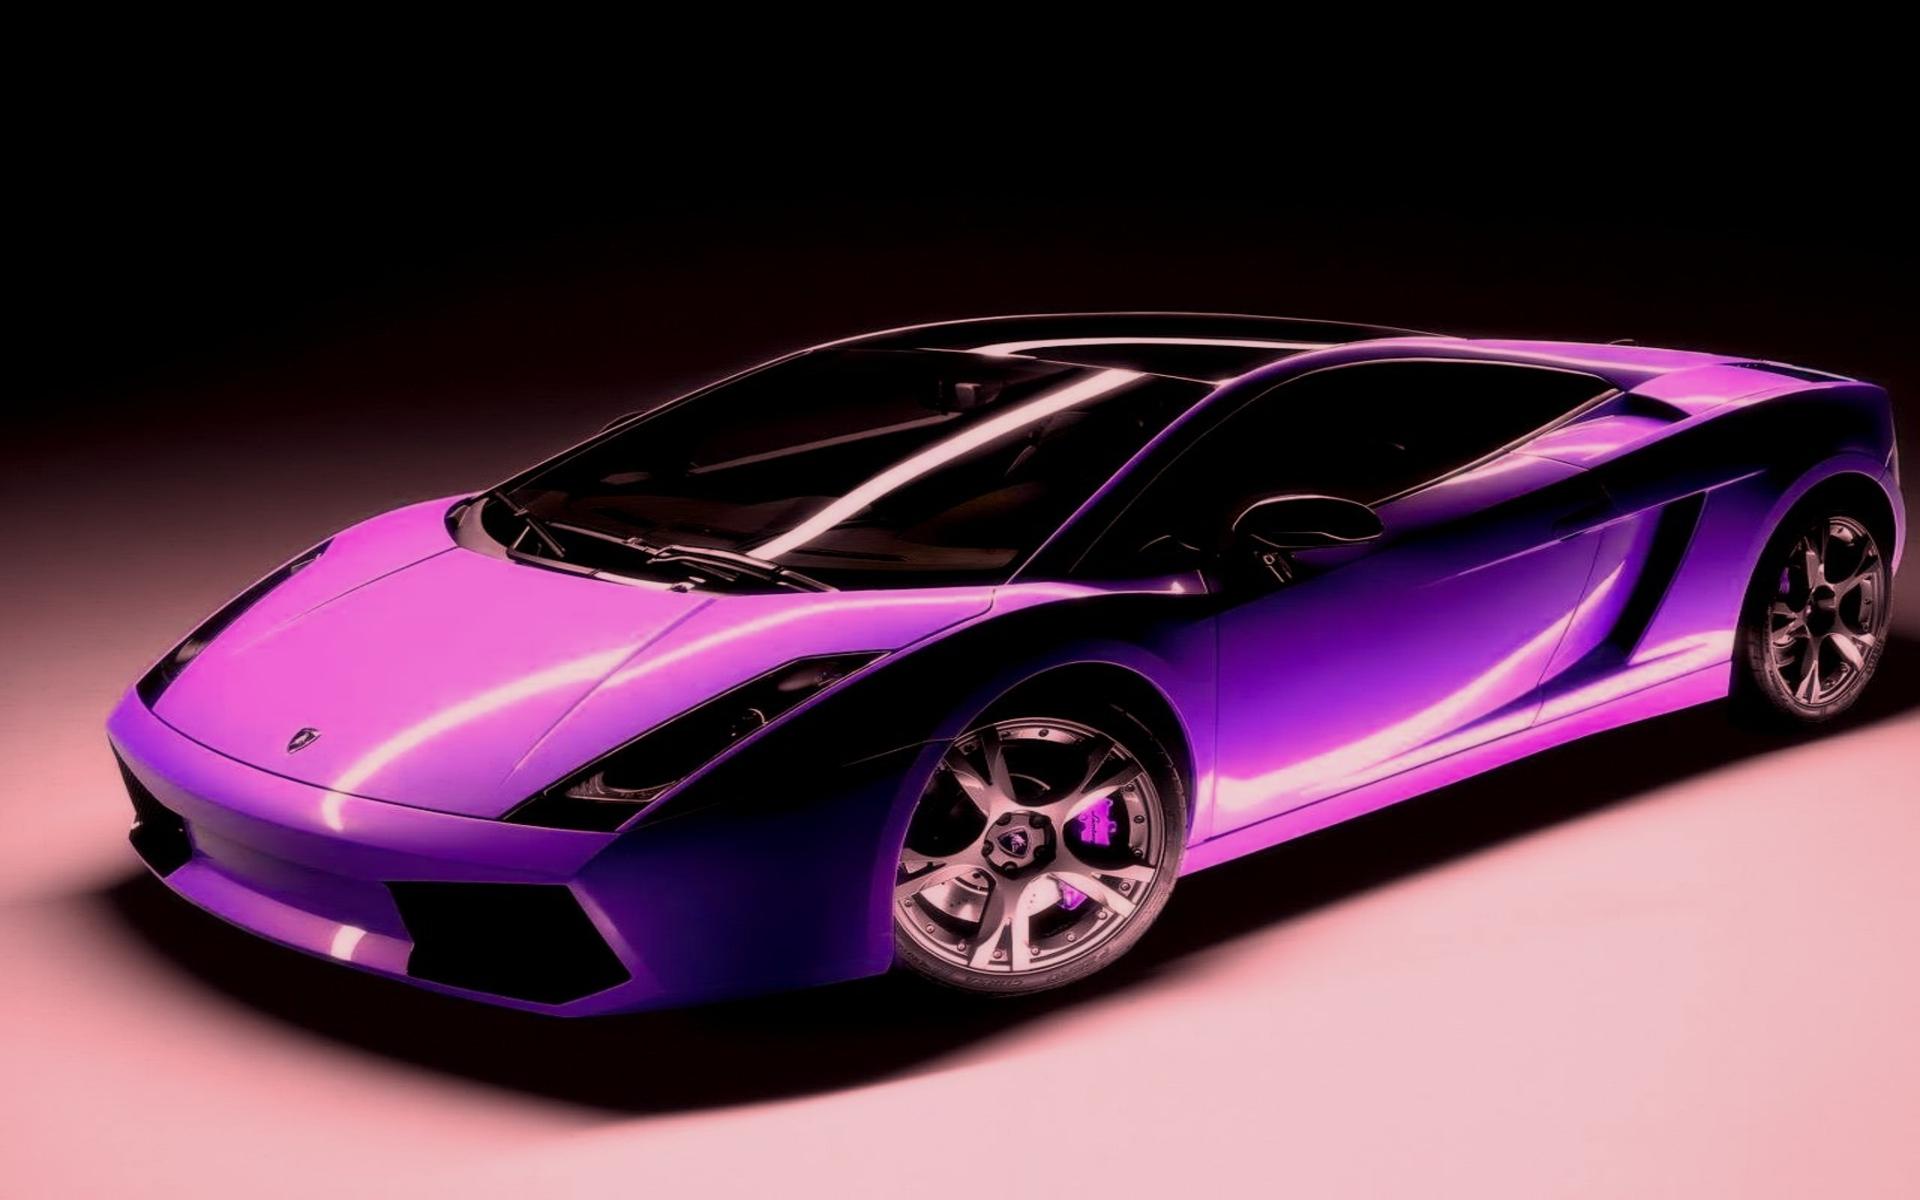 Purple Lamborghini Desktop For Iphone